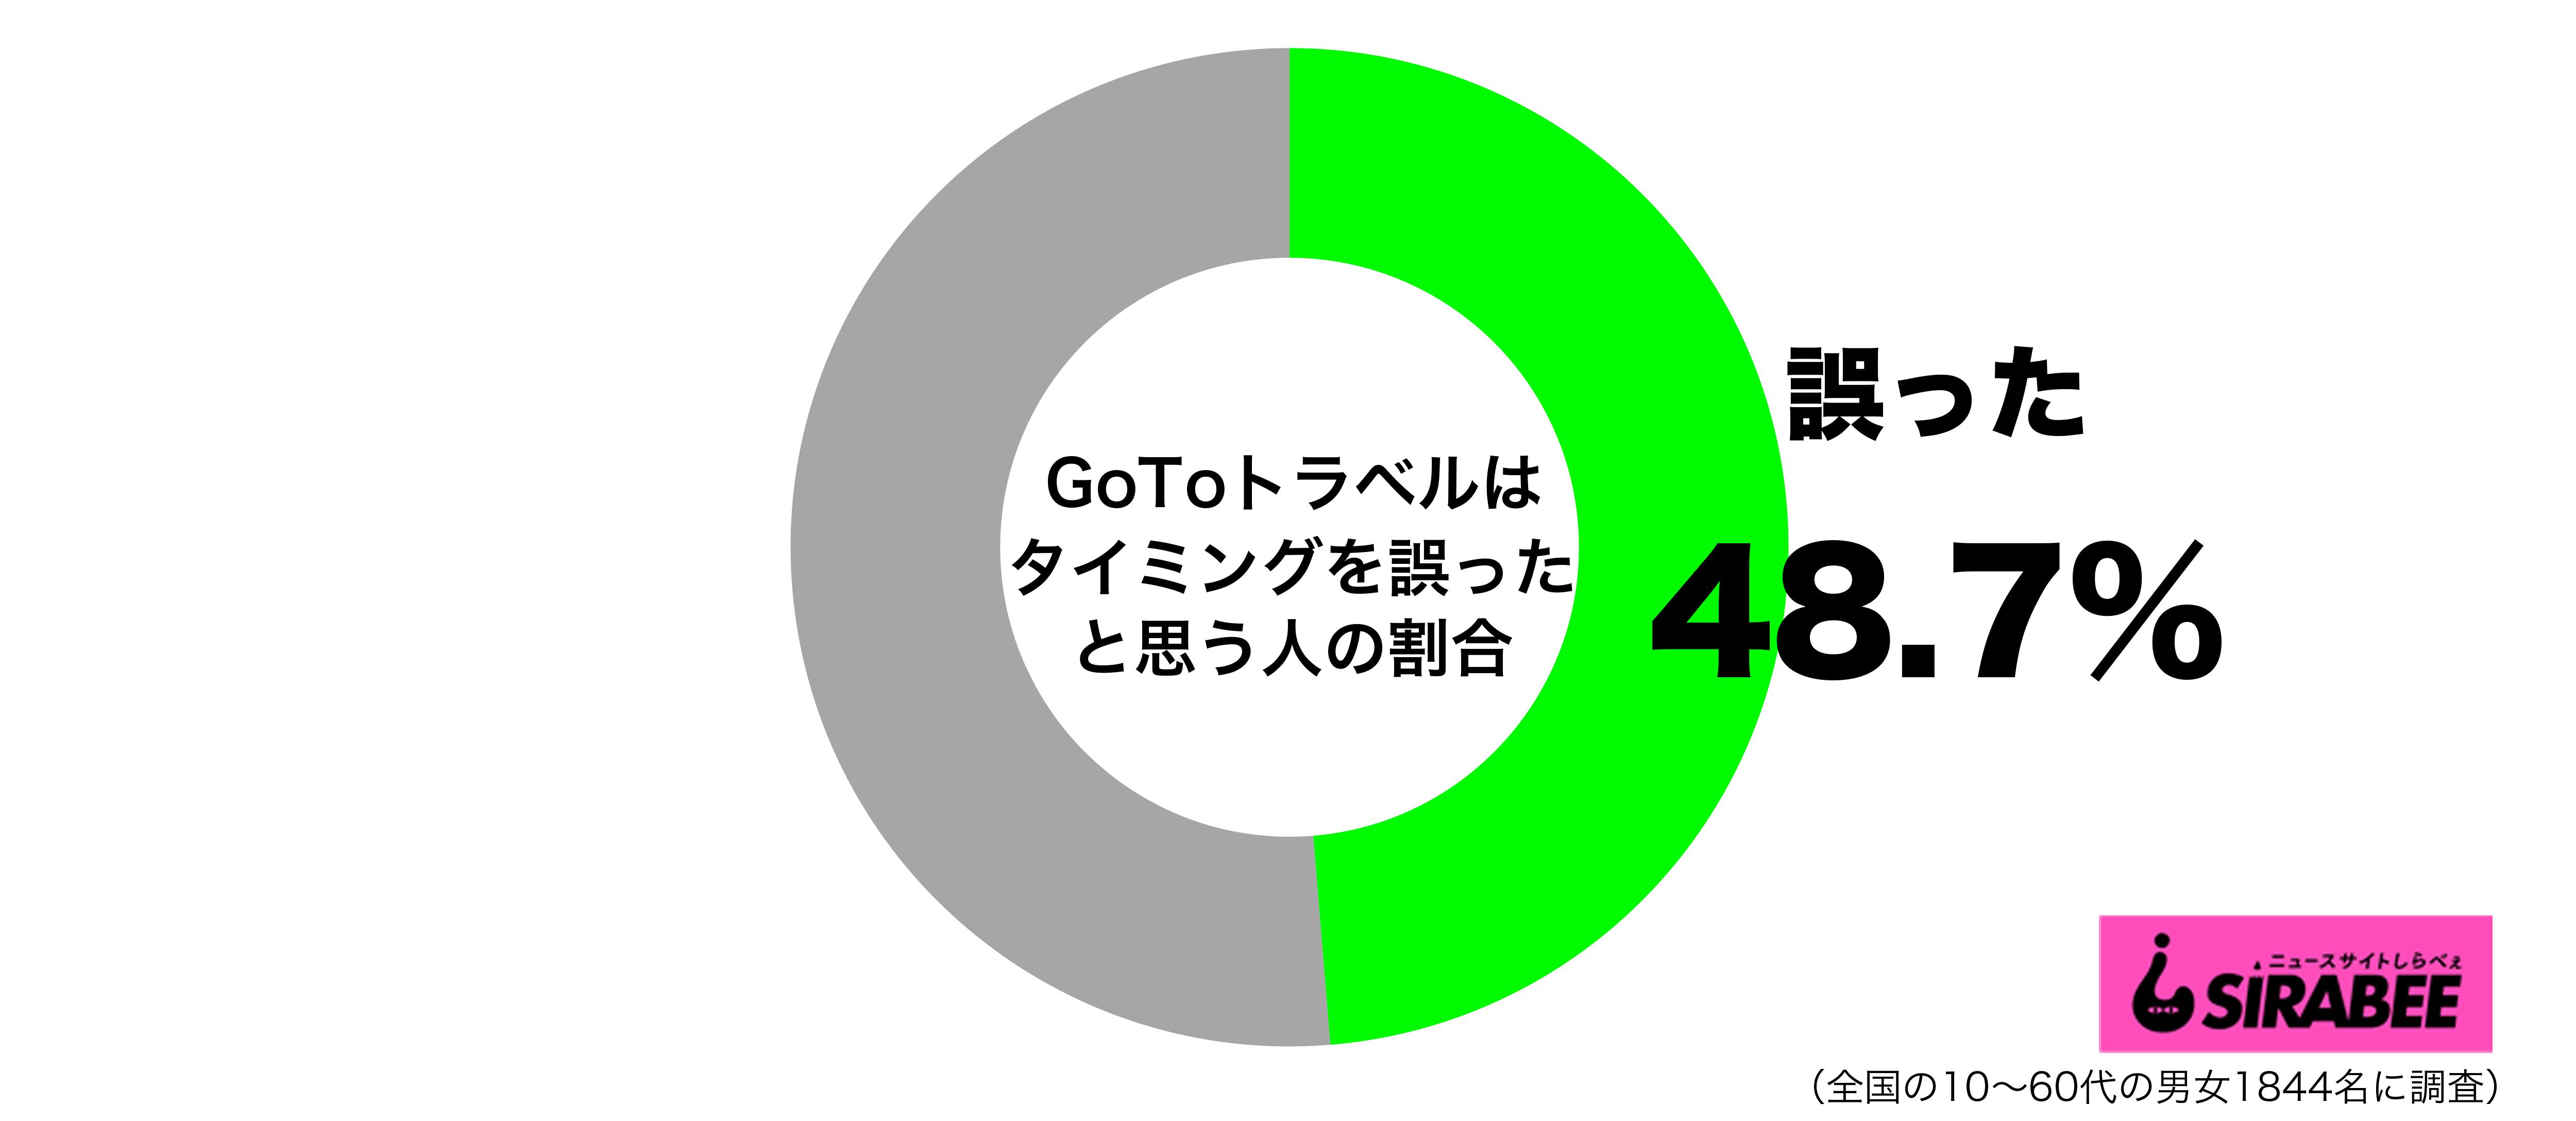 GoToトラベルキャンペーンはタイミングを誤ったと思うグラフ